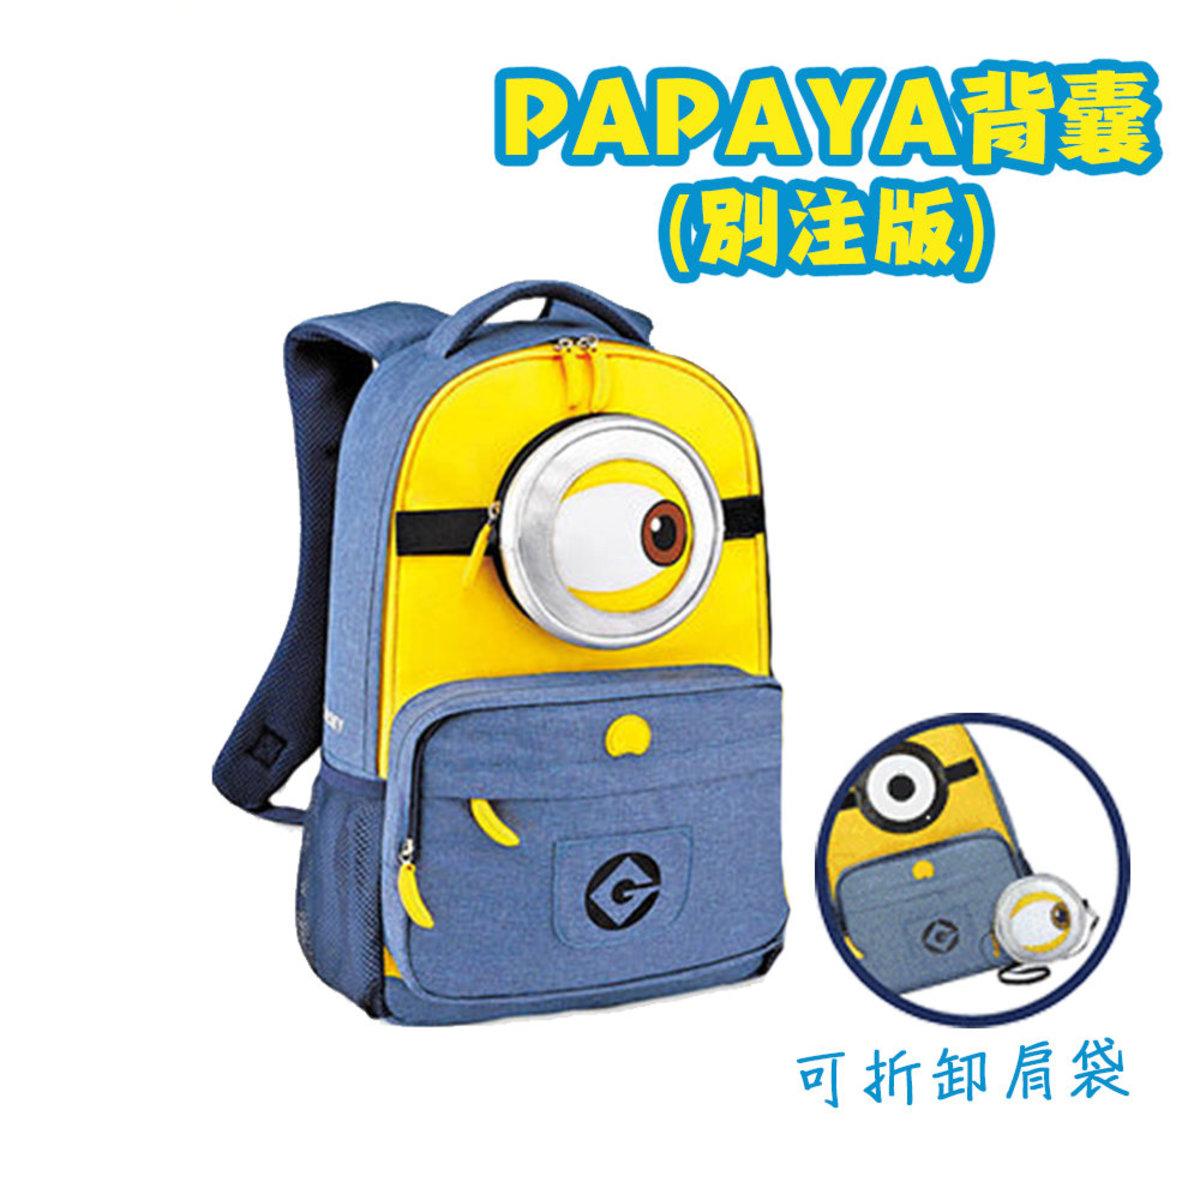 Minions PAPAYA Backpack (Special Edition)